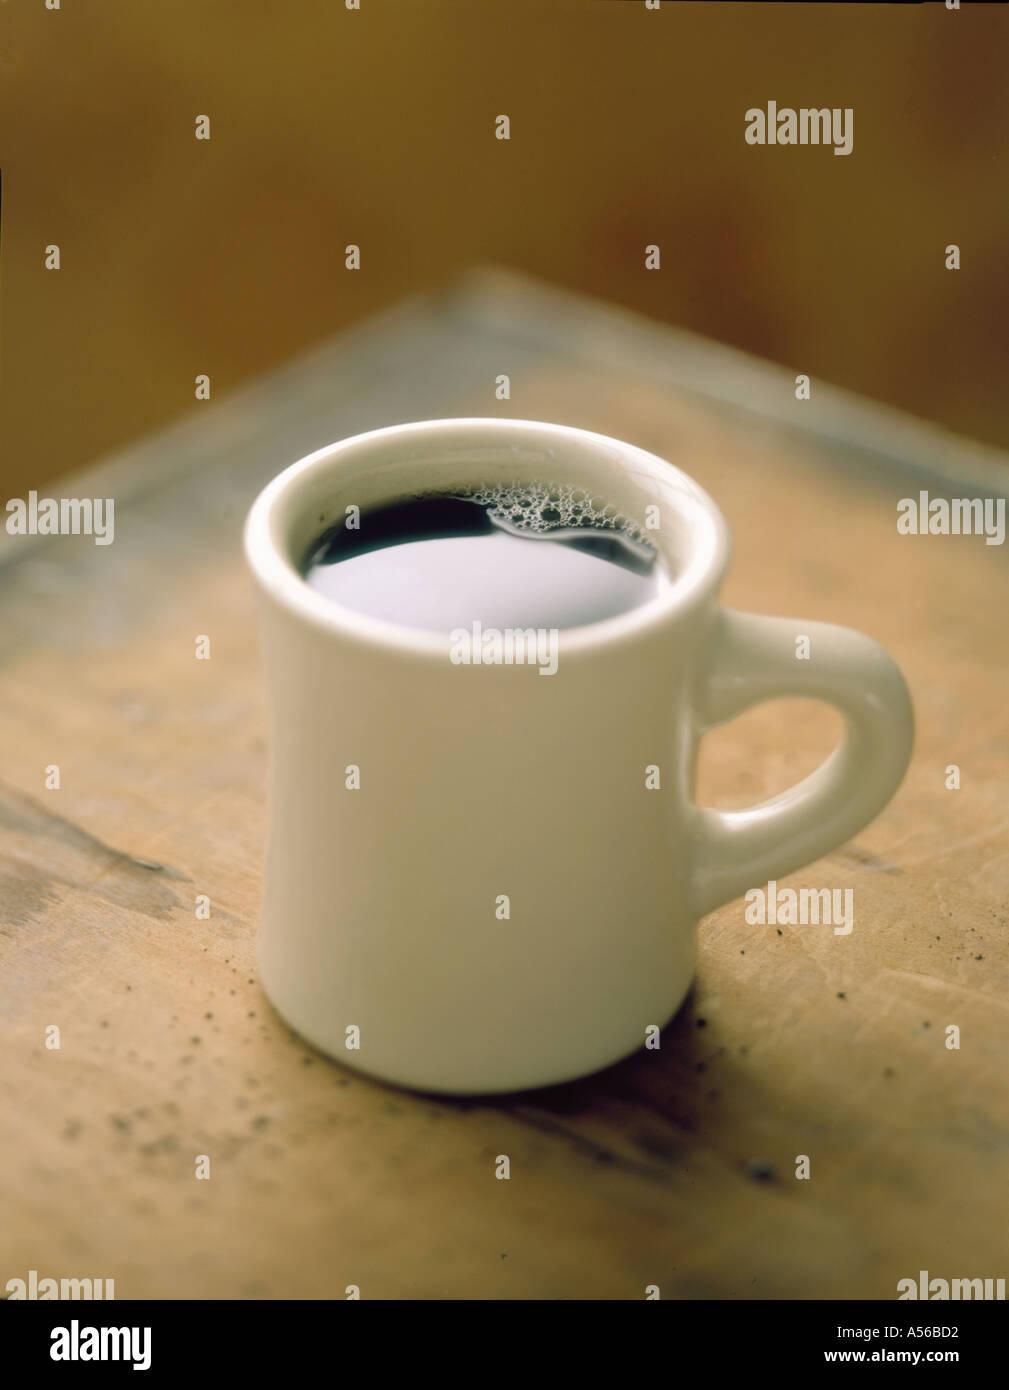 Mug of coffee sitting on corner of table - Stock Image